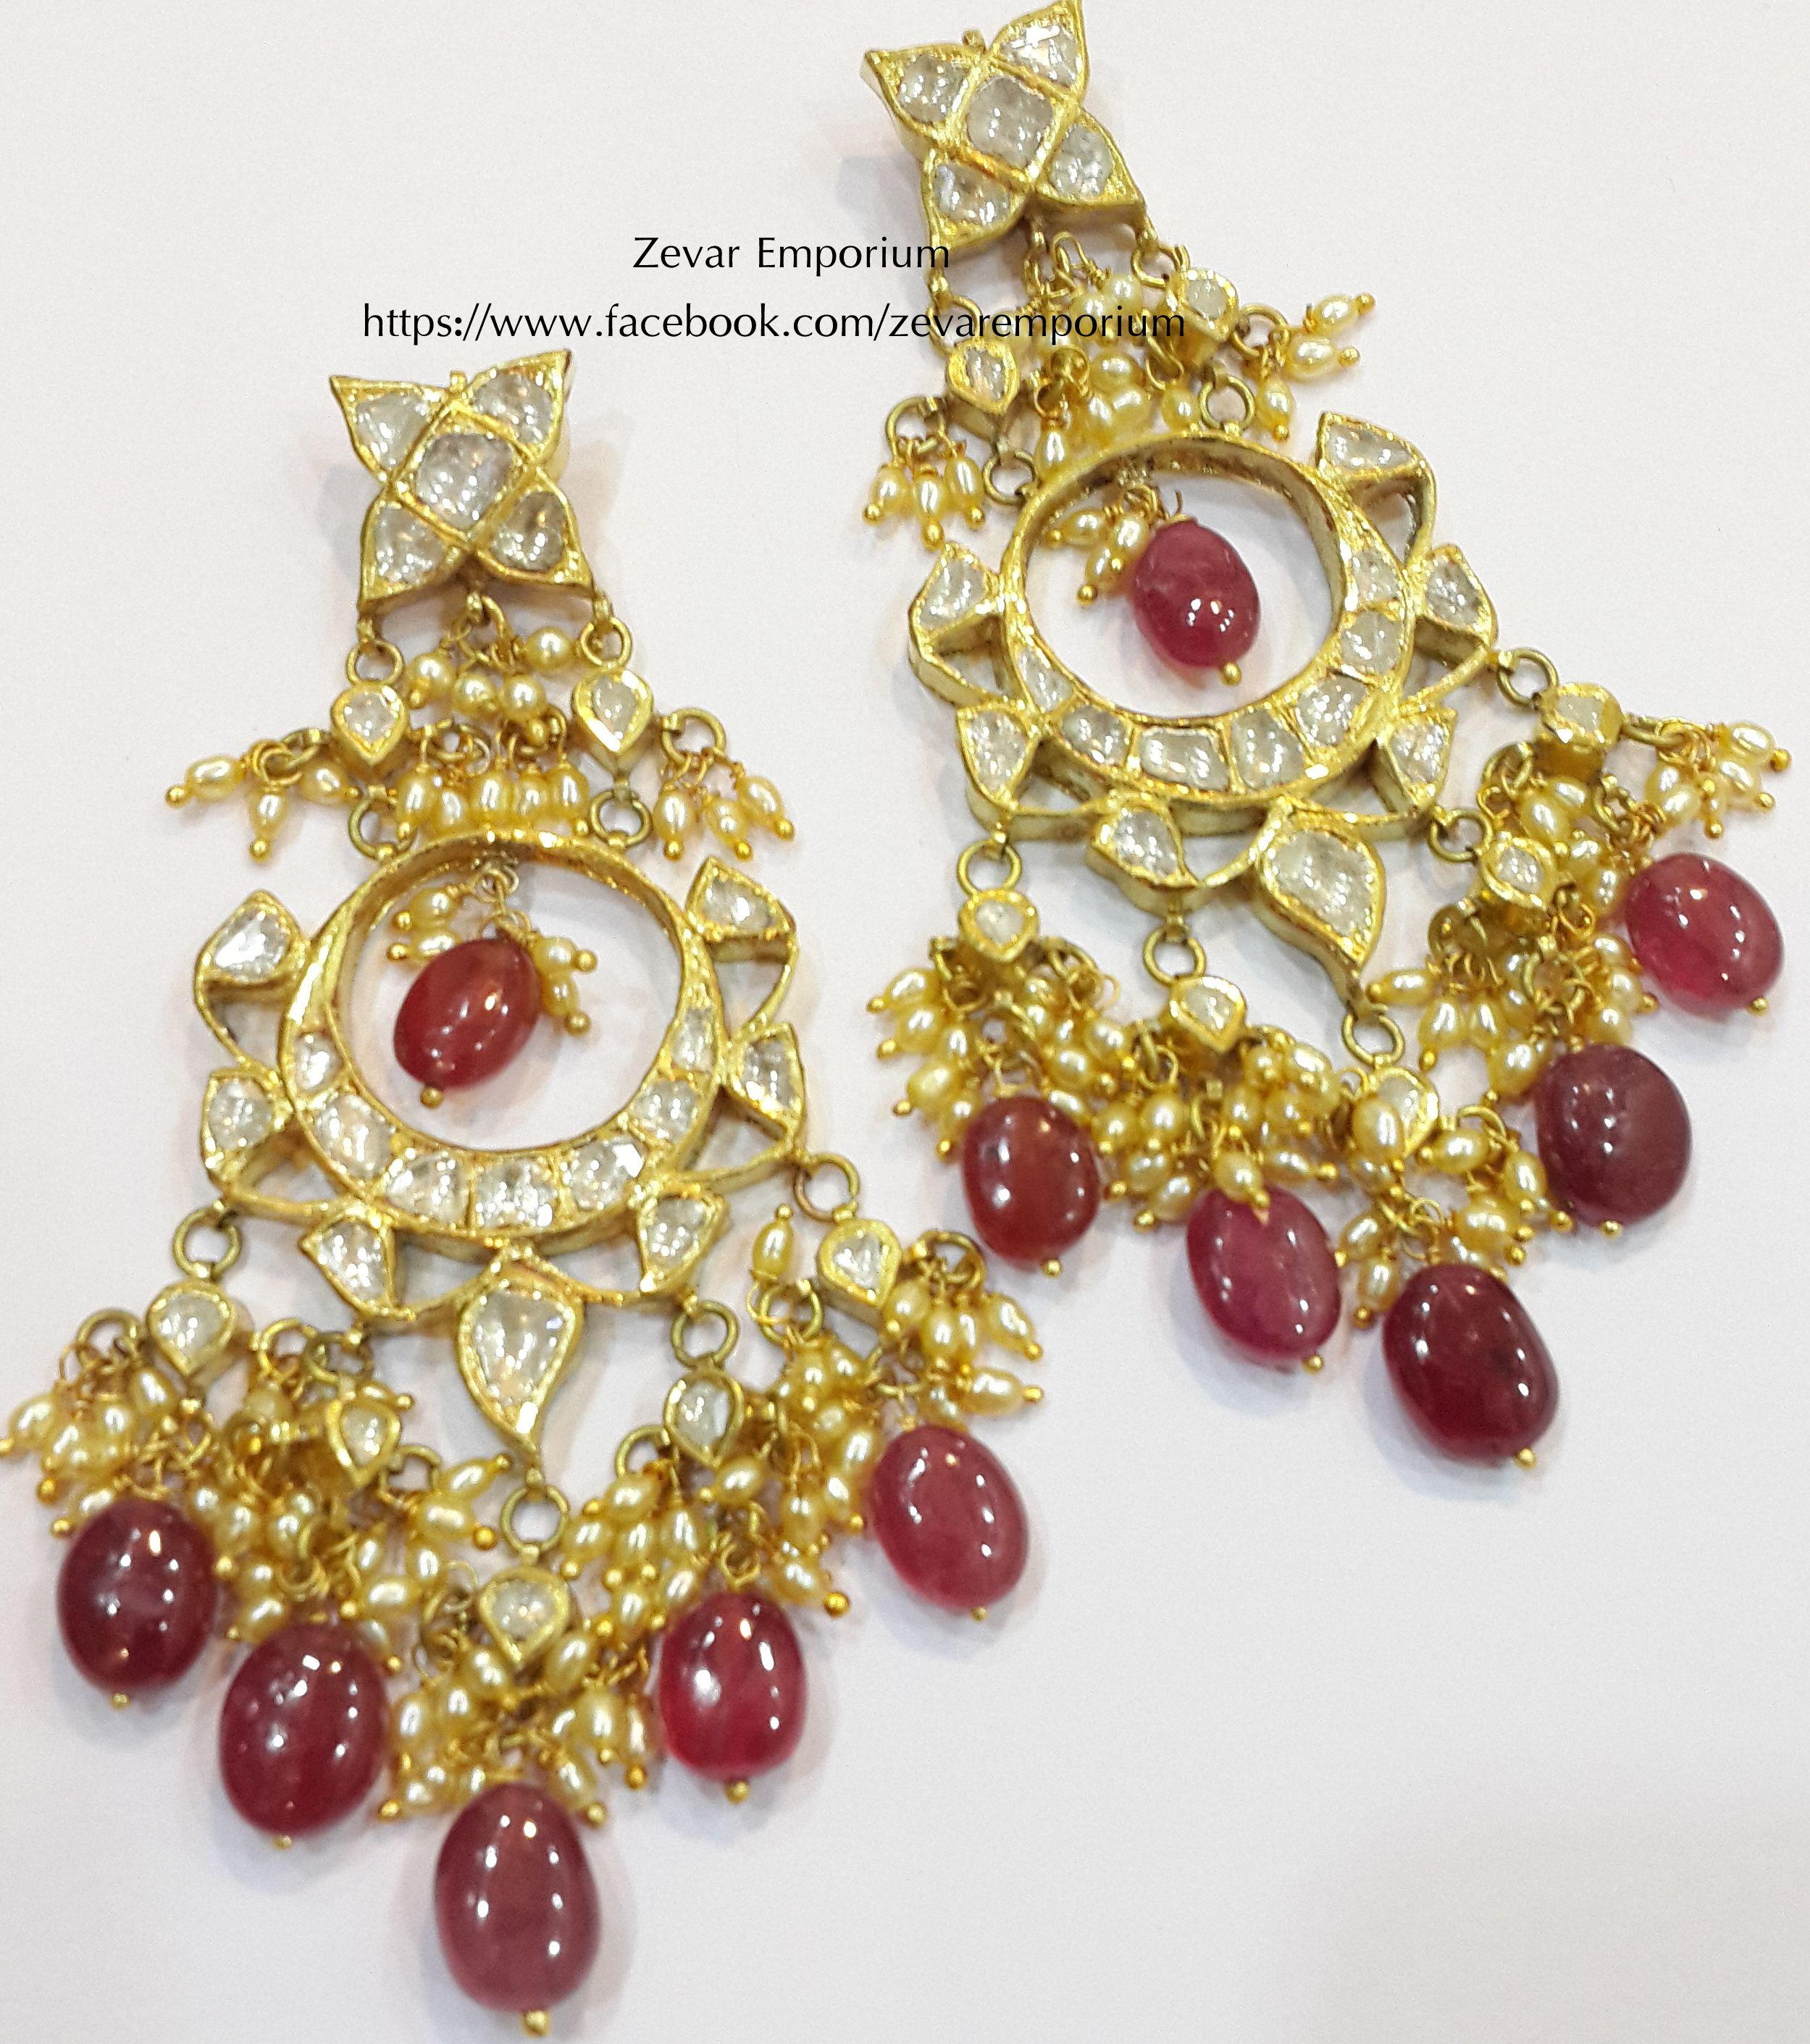 Hallmarked Gold Enamel Jewelry Jewellery